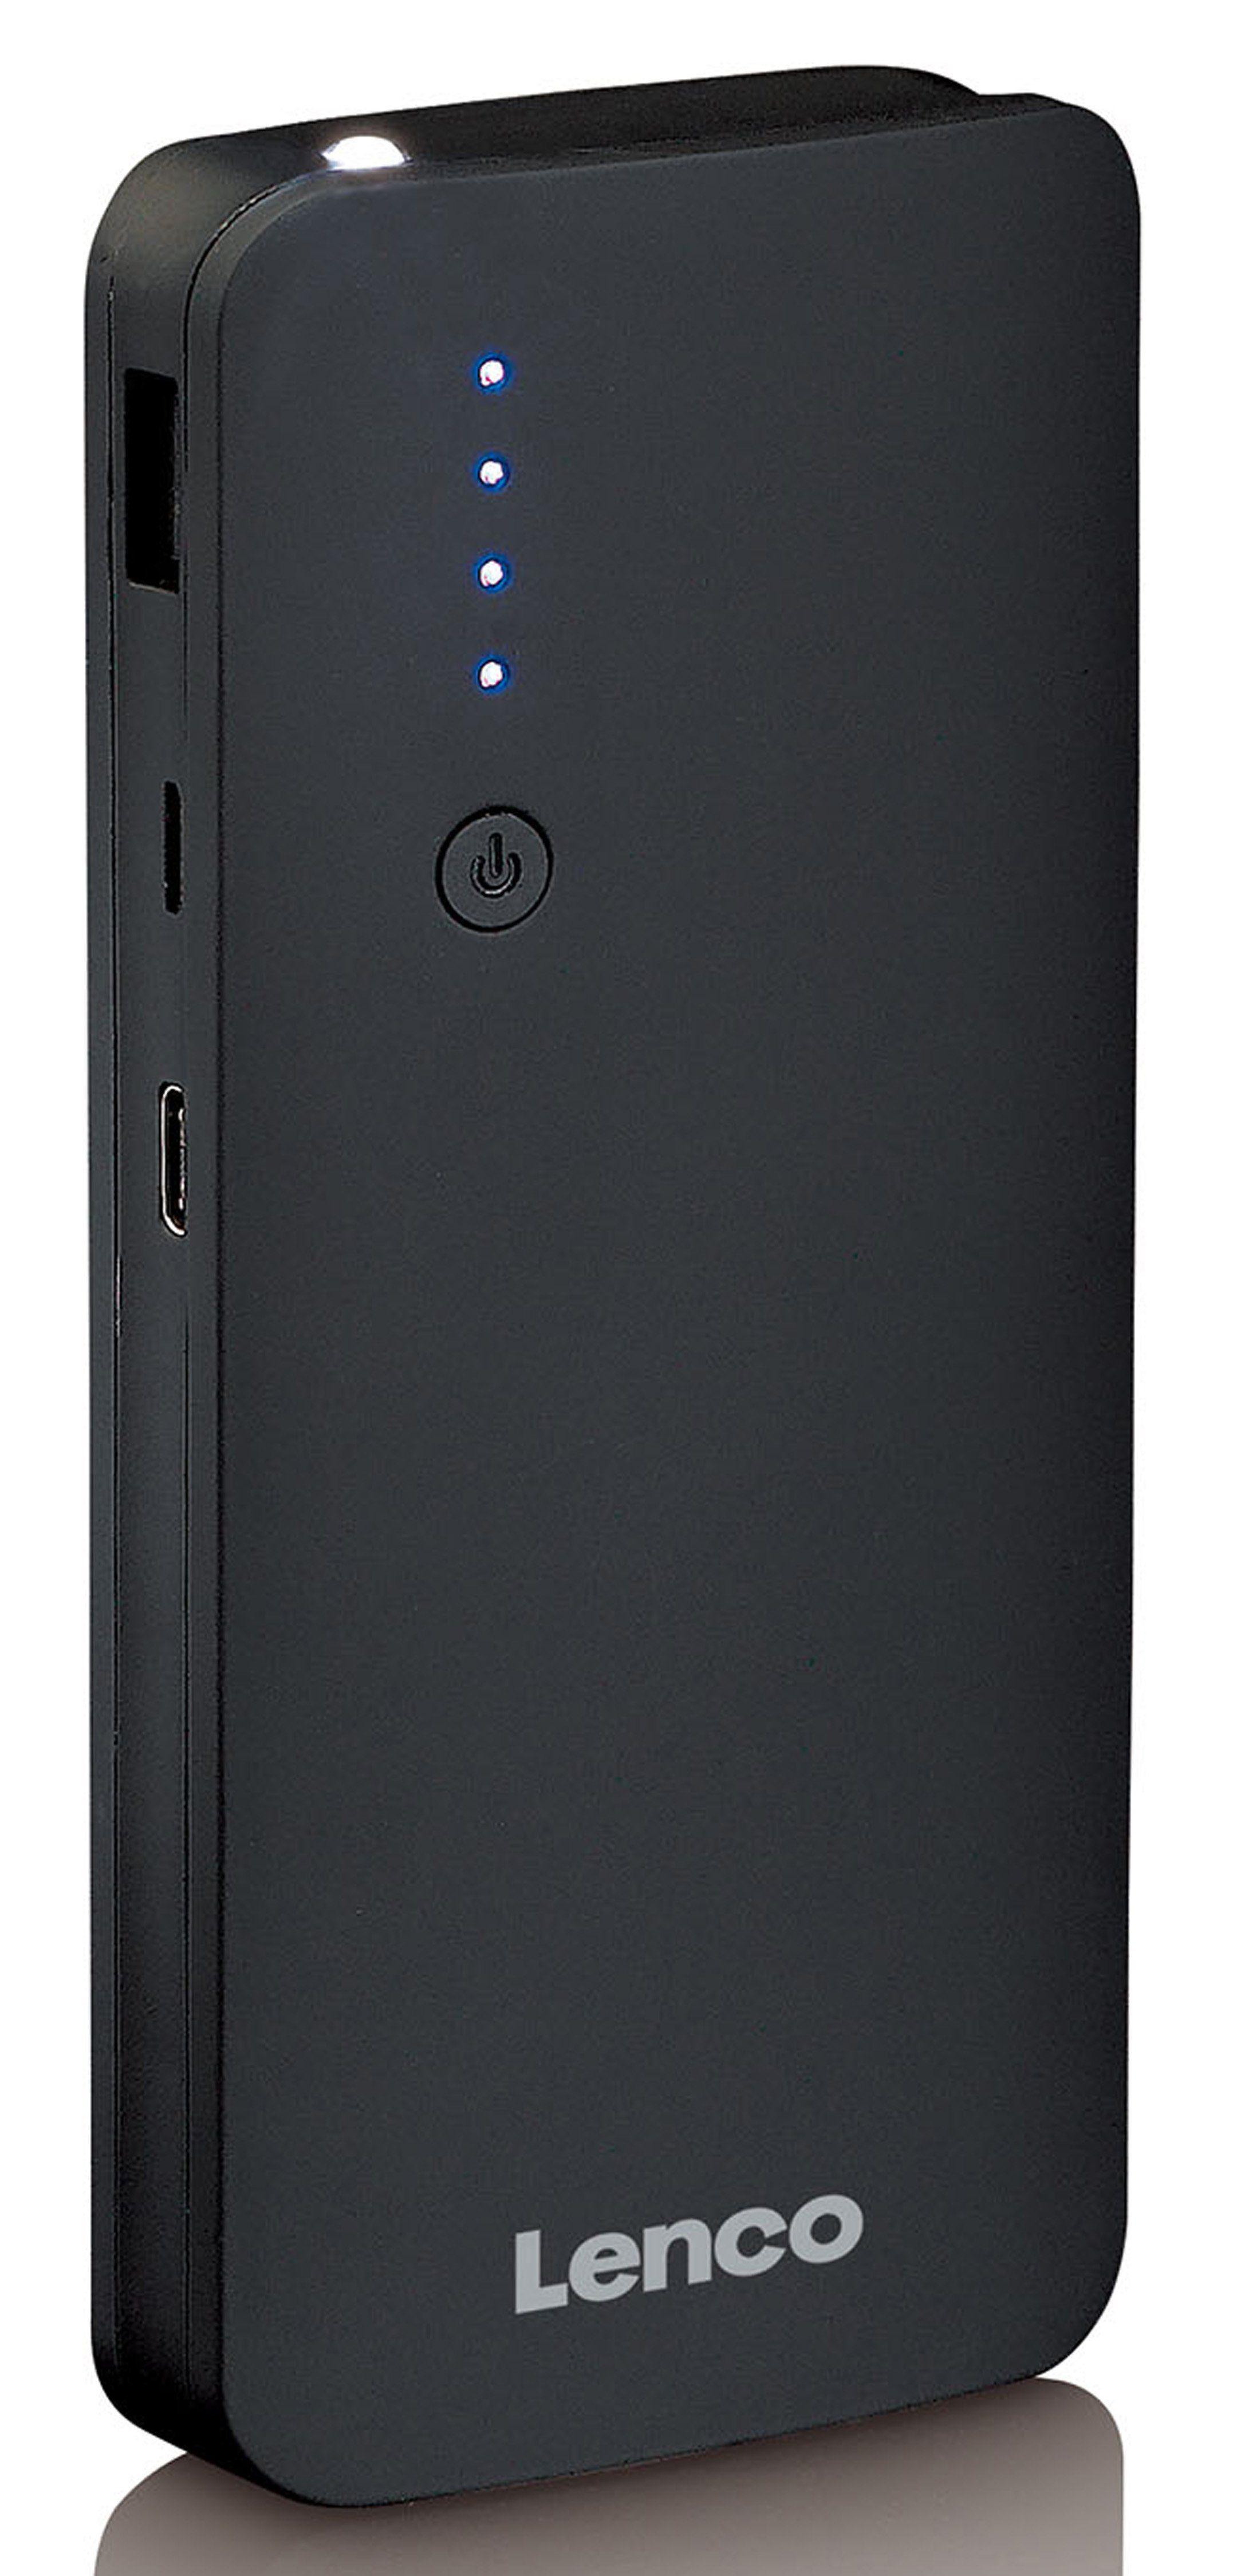 Lenco Powerbank - Akkupack, USB-C und Quick Charge 2.0 & 3.0 »PBQ-1050«